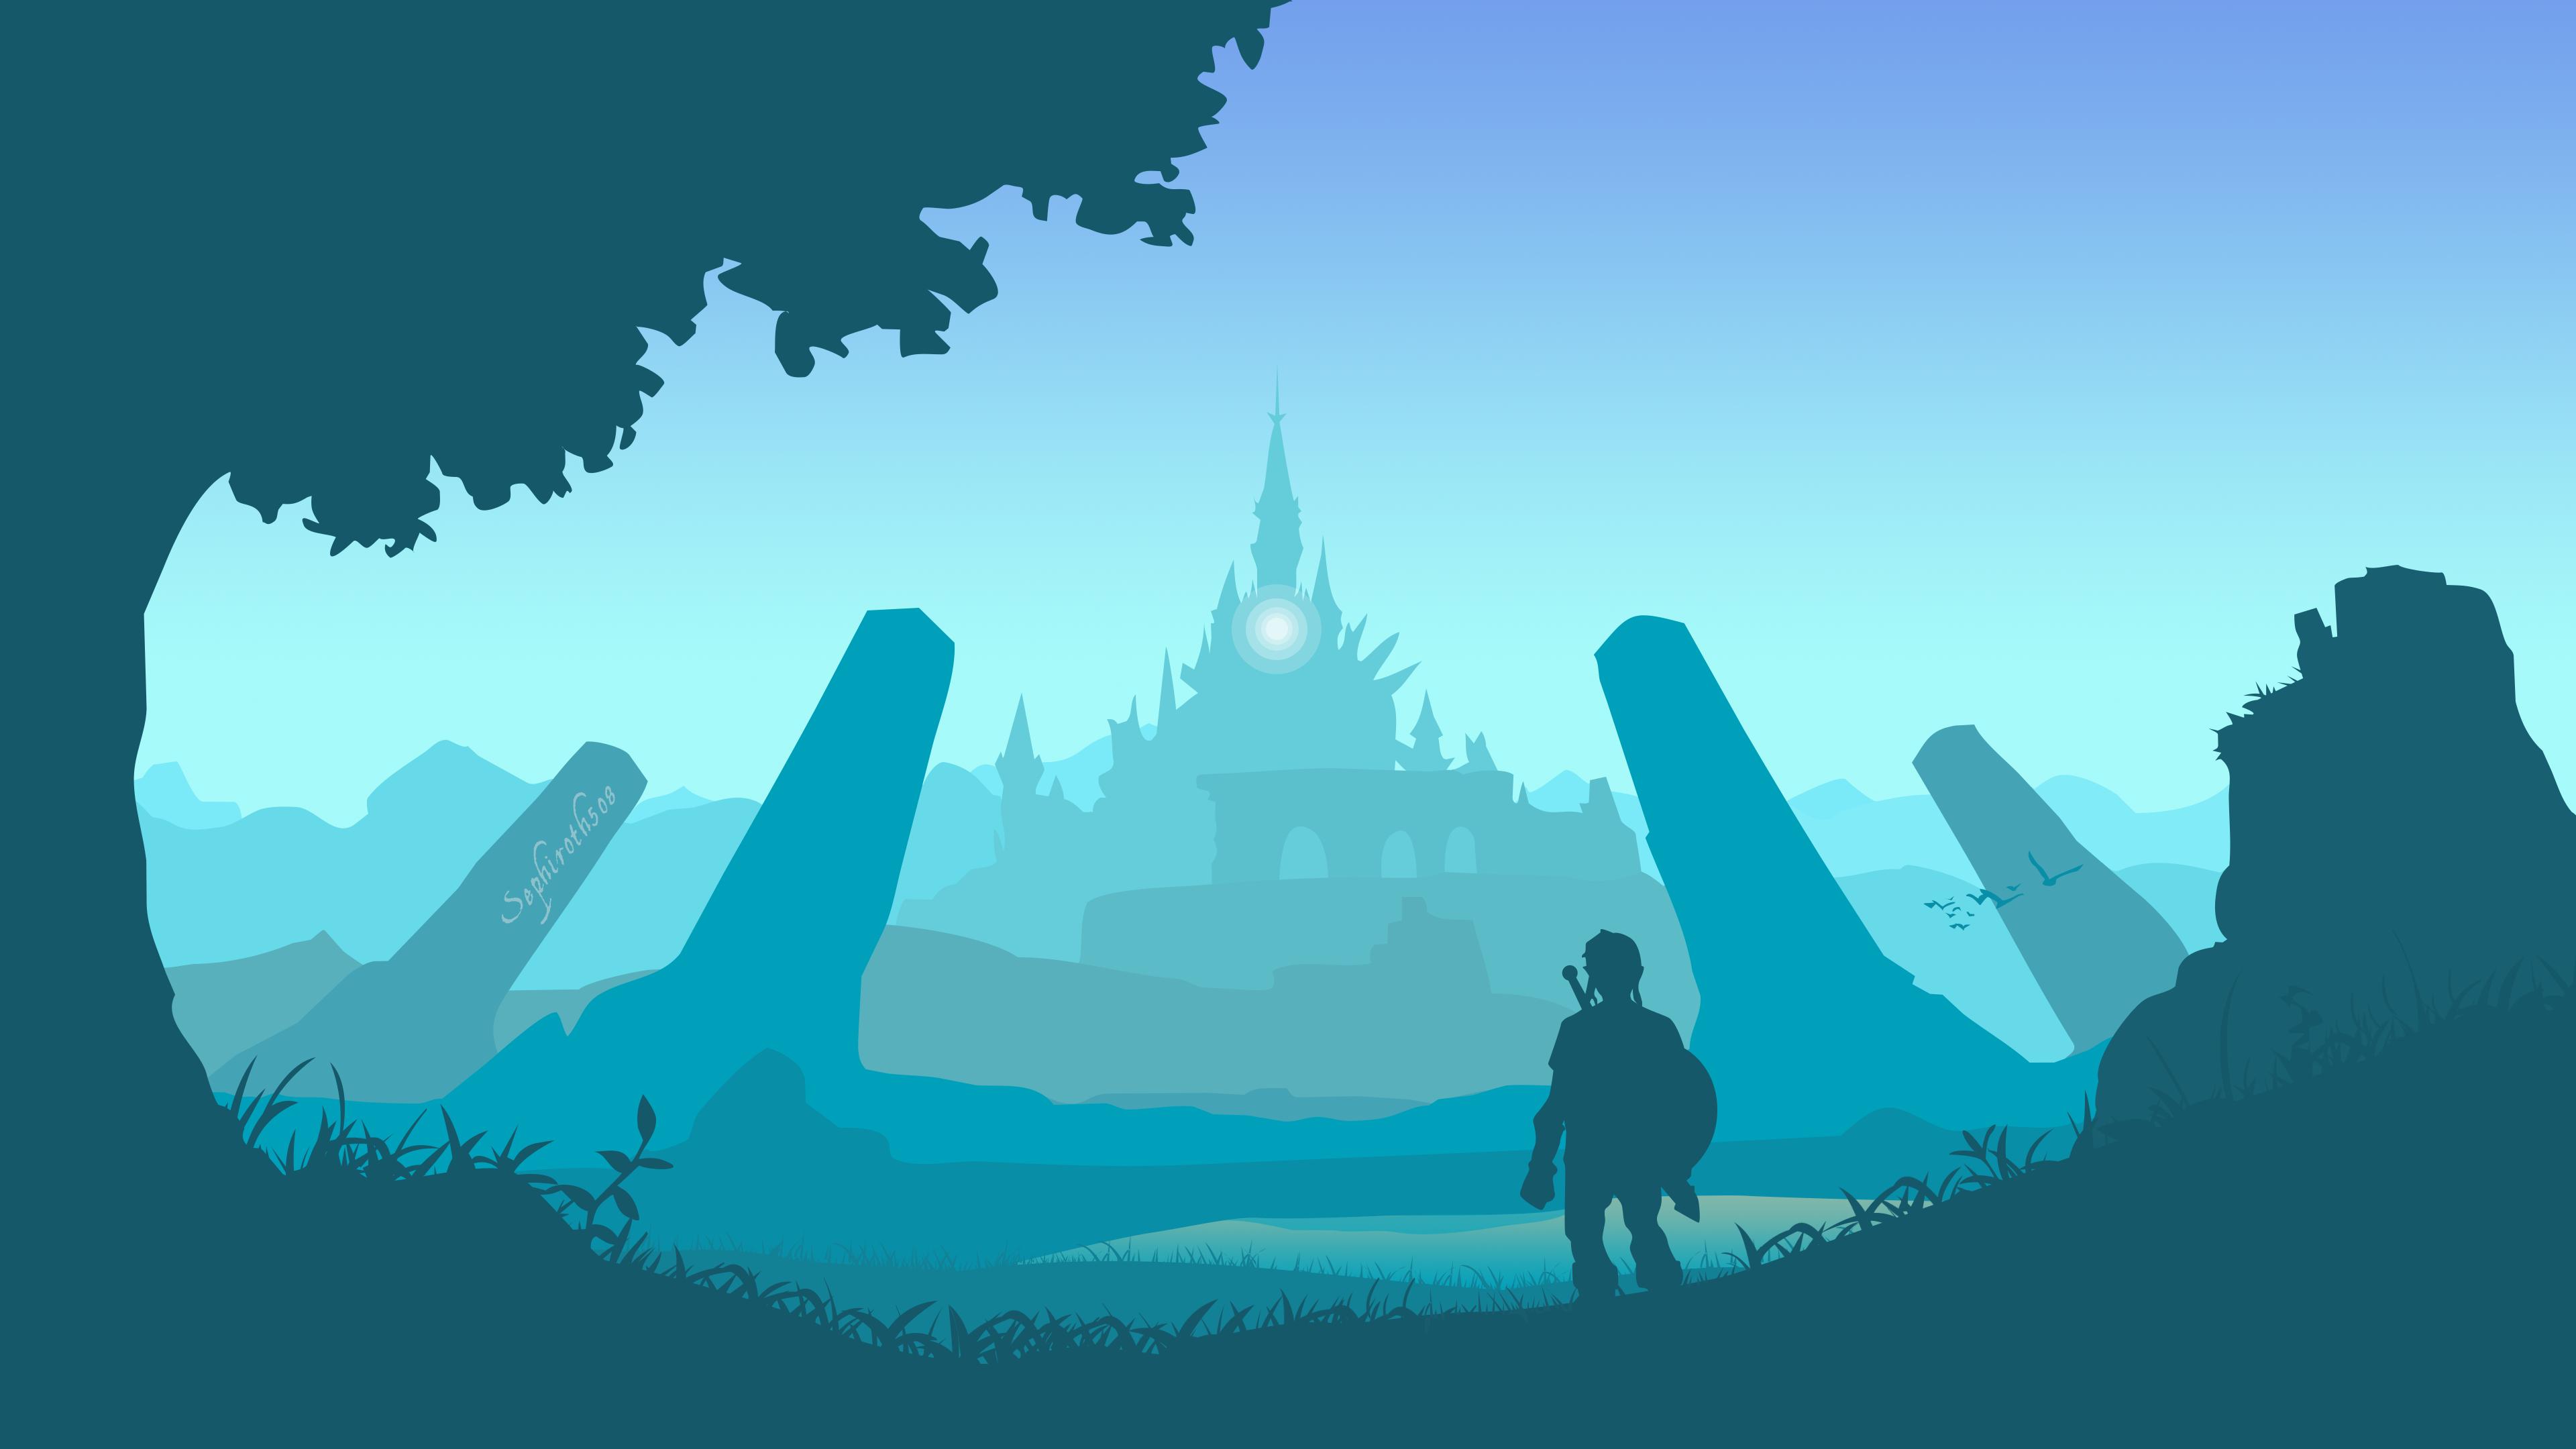 Hyrule | Legend of Zelda: Breath of the Wild